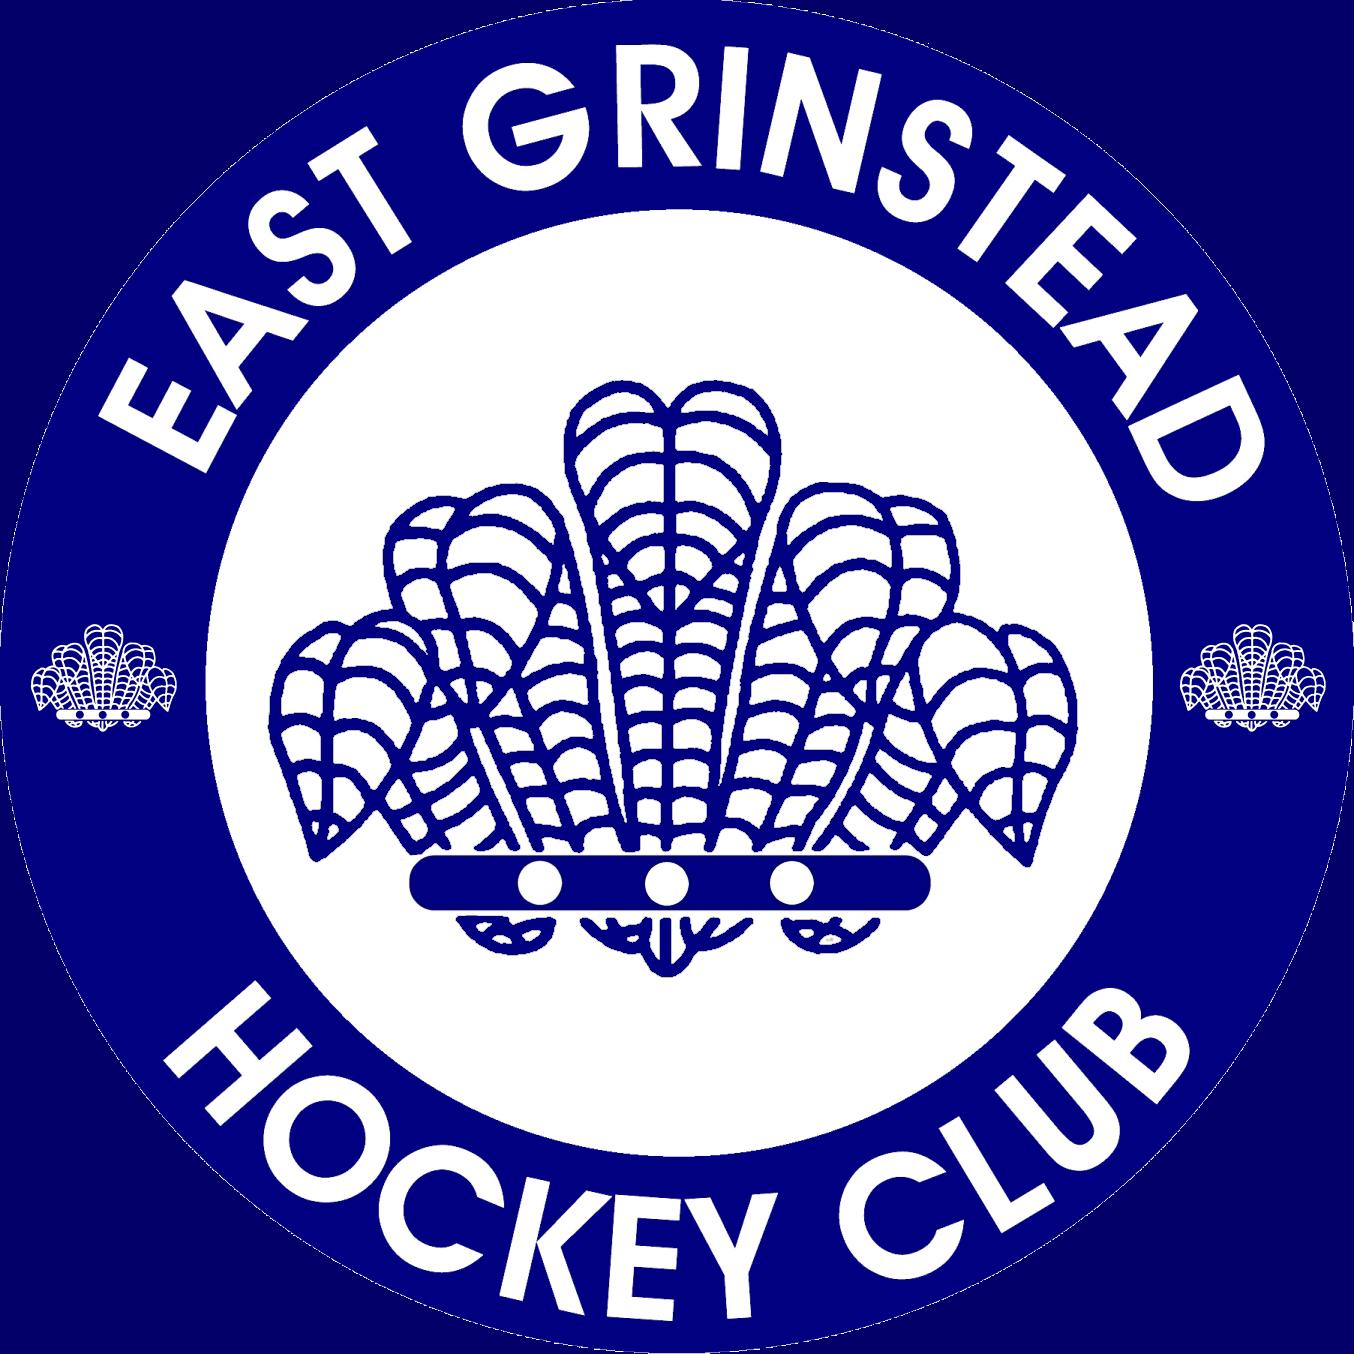 Logo of East Grinstead